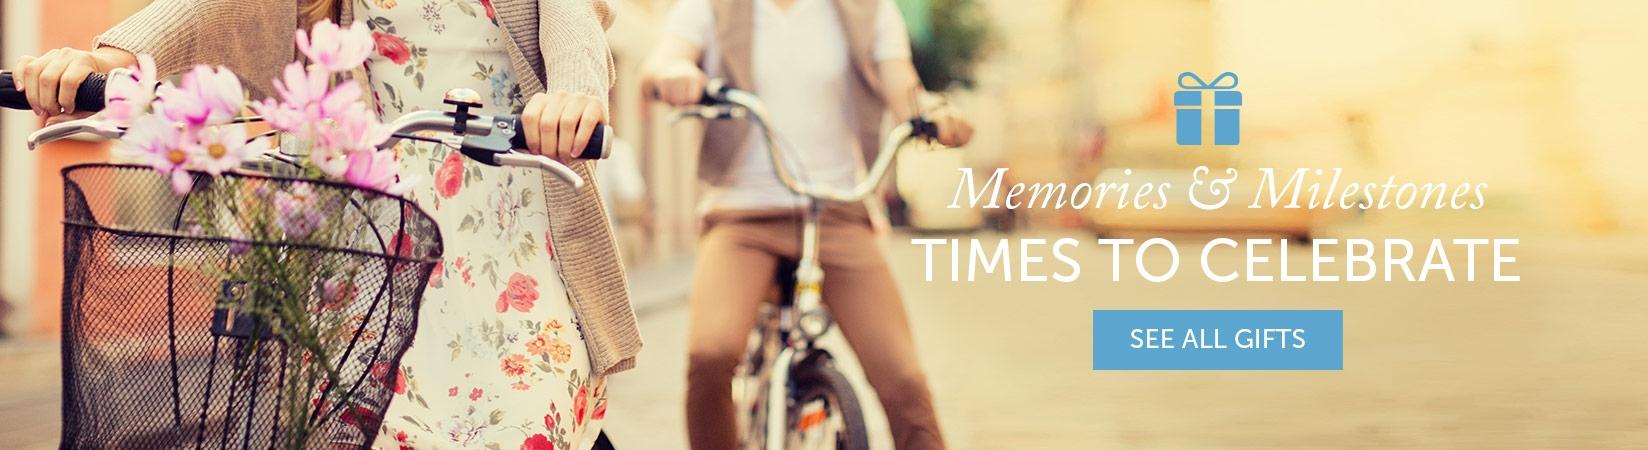 Memories & Milestones |Time To Celebrate